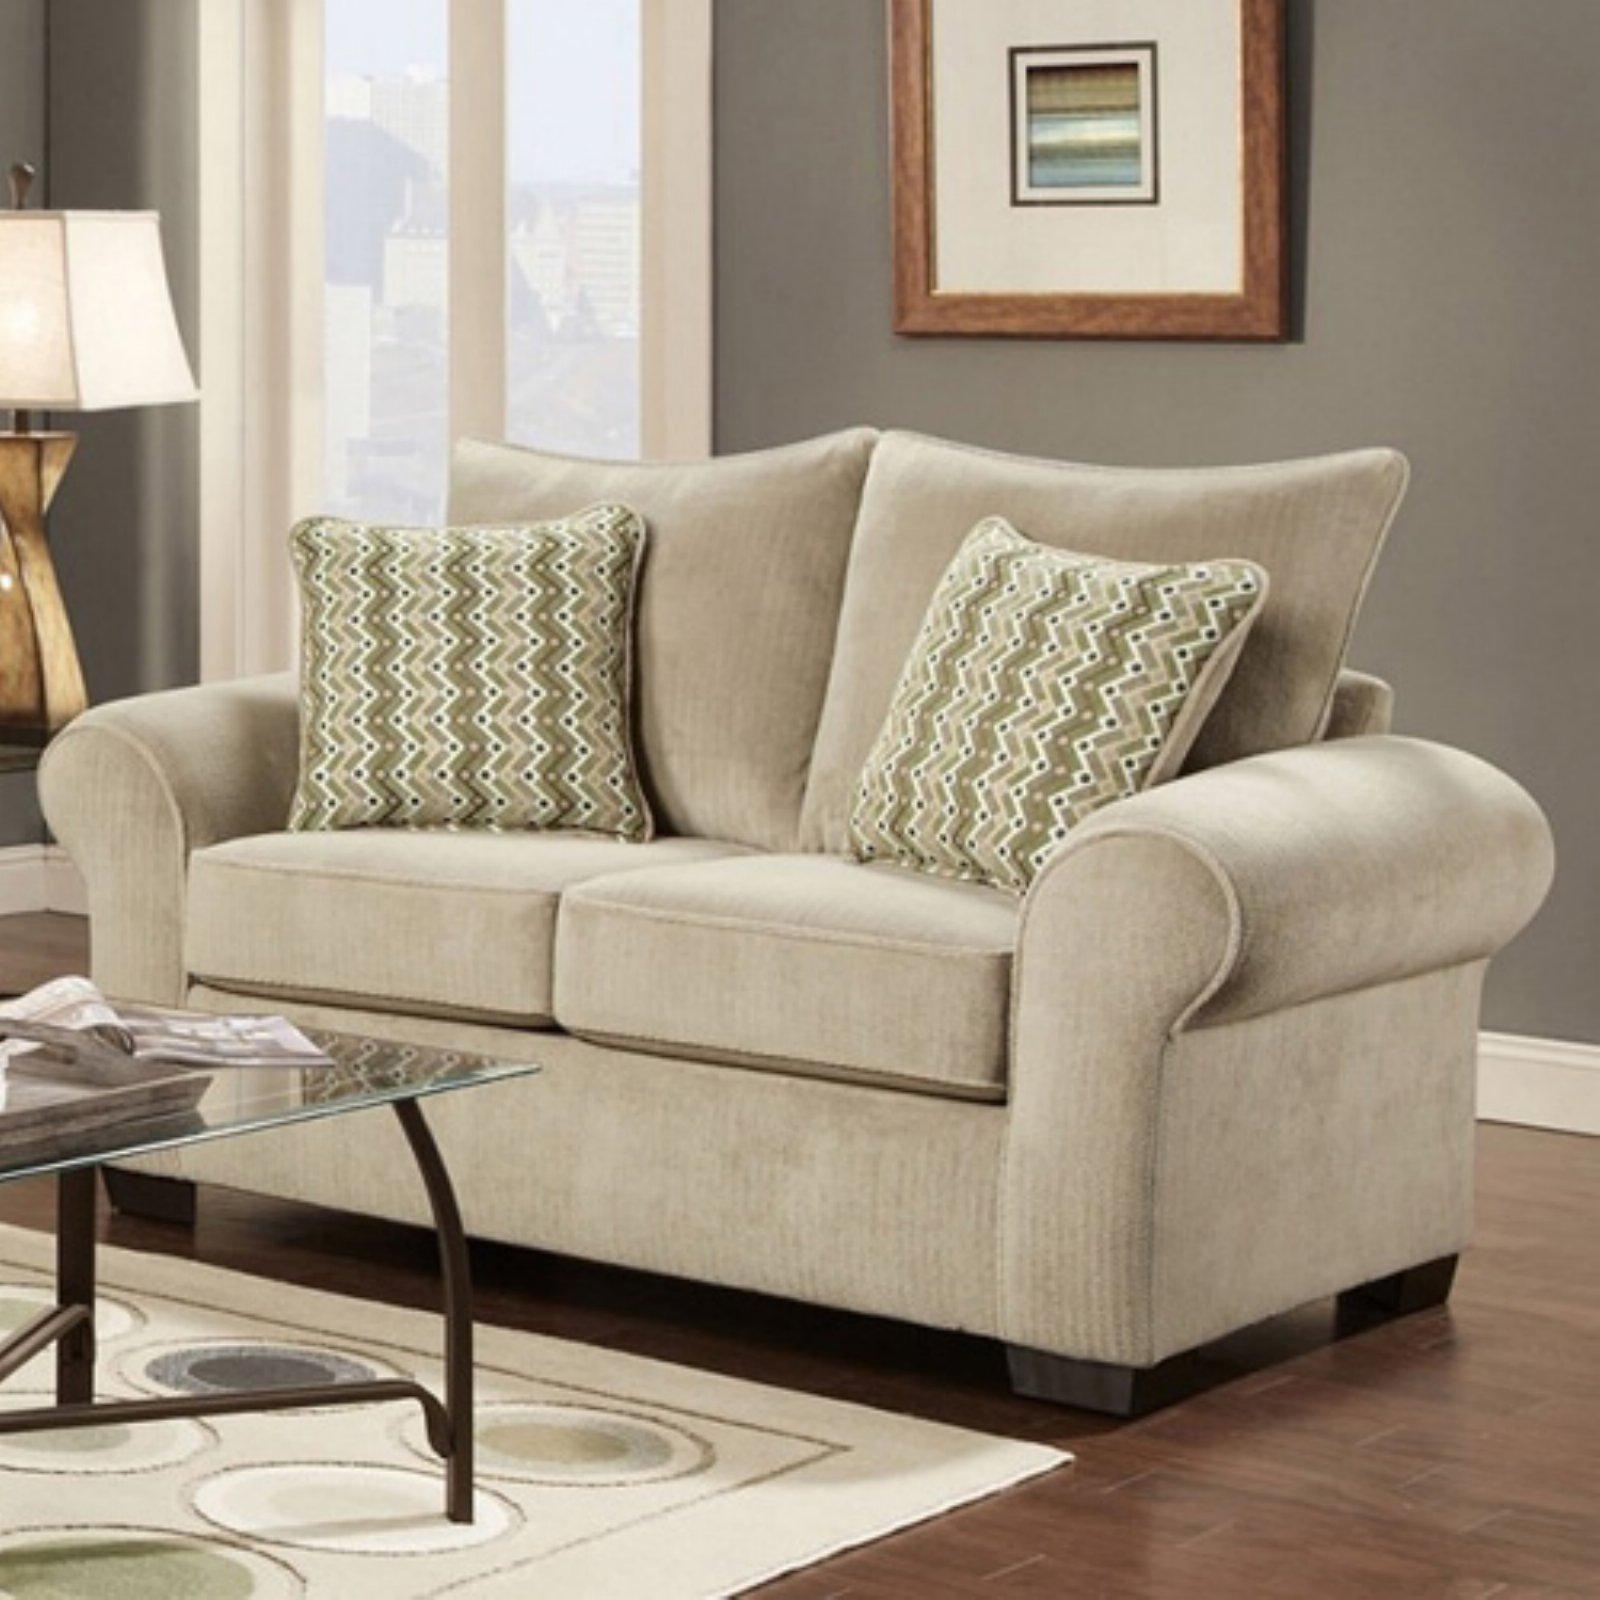 Chelsea Home Furniture Hagan Queen Sleeper Sofa